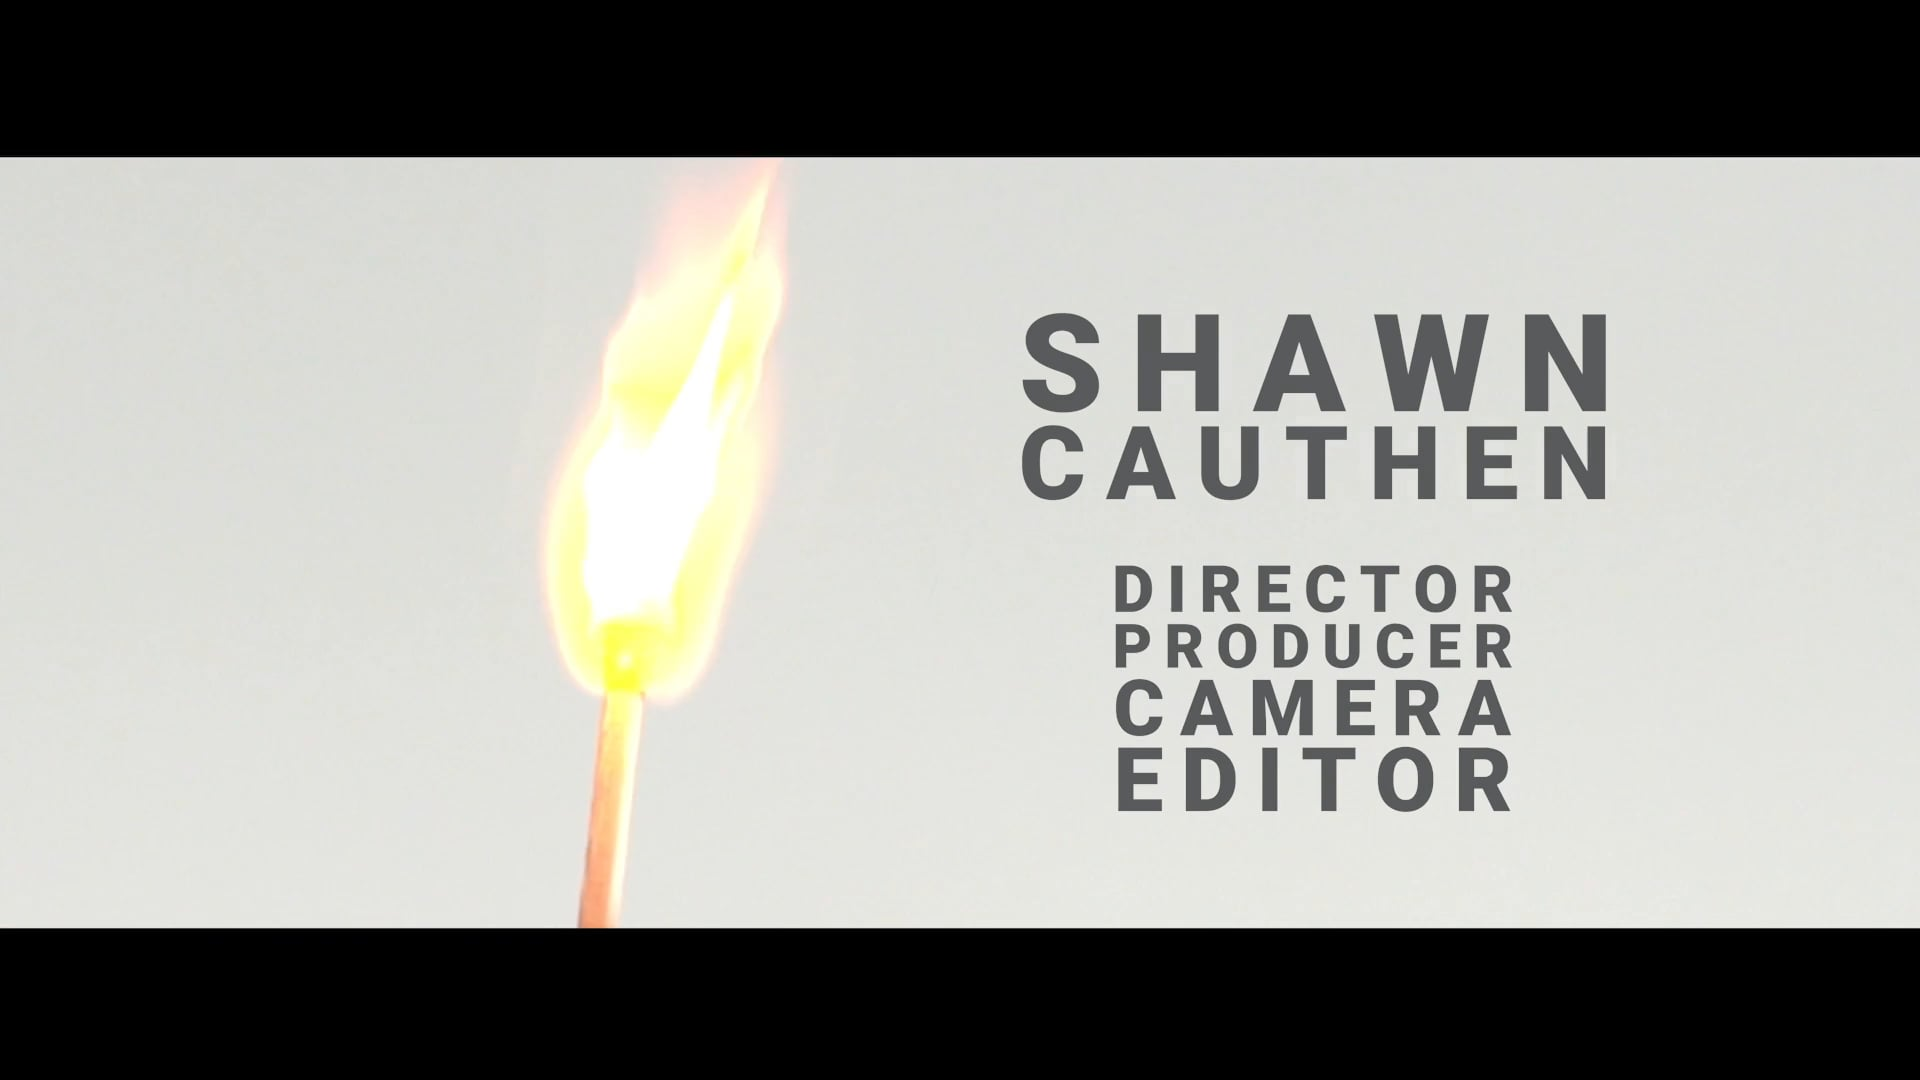 Shawn Cauthen's Reel - texasmoviedirector@gmail.com